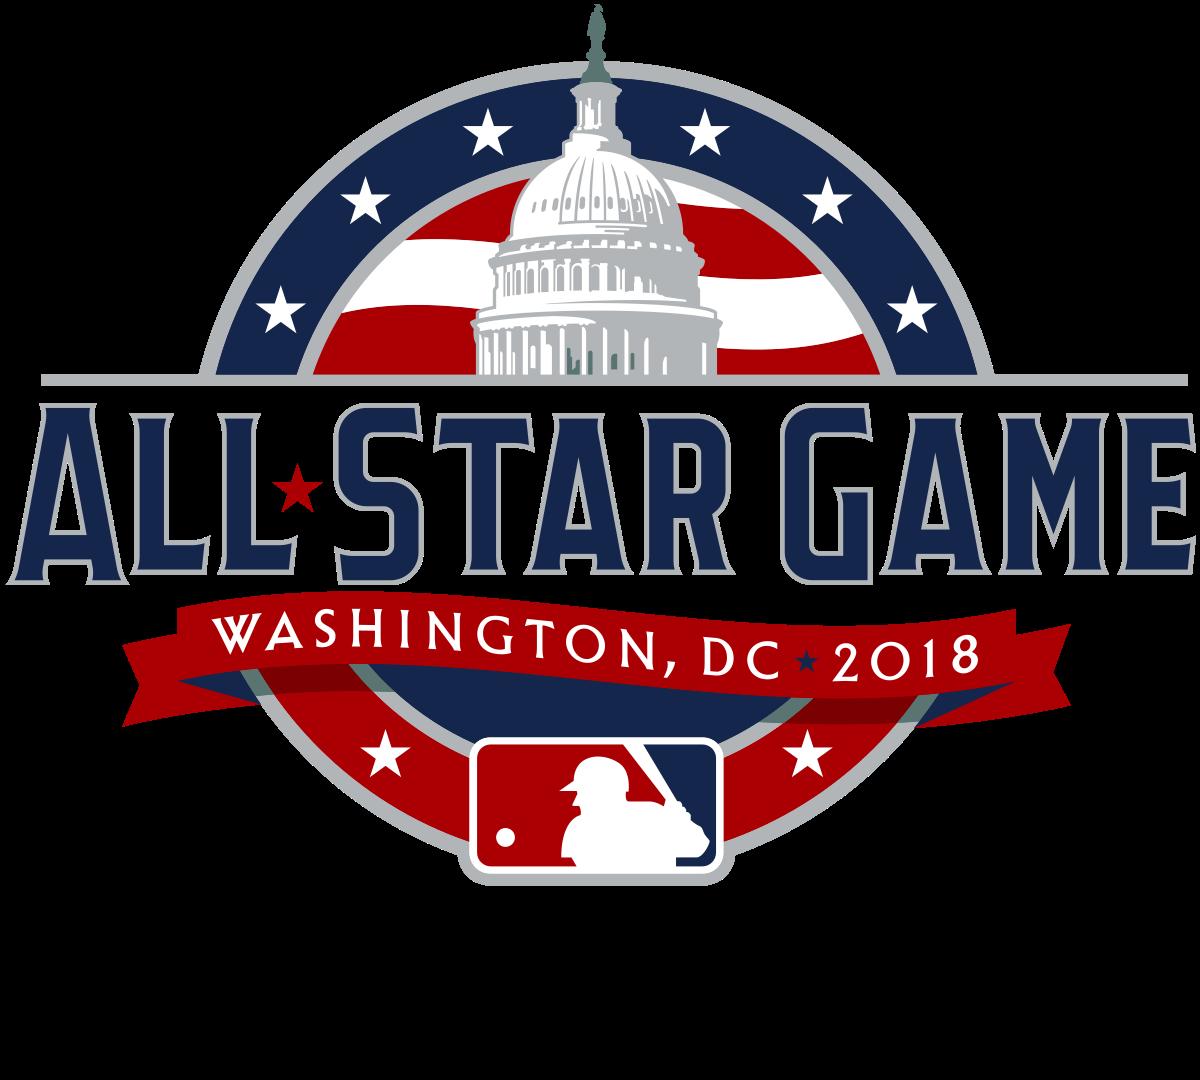 All Star Game Logo 2018 Png Image Game Logo All Star Major League Baseball